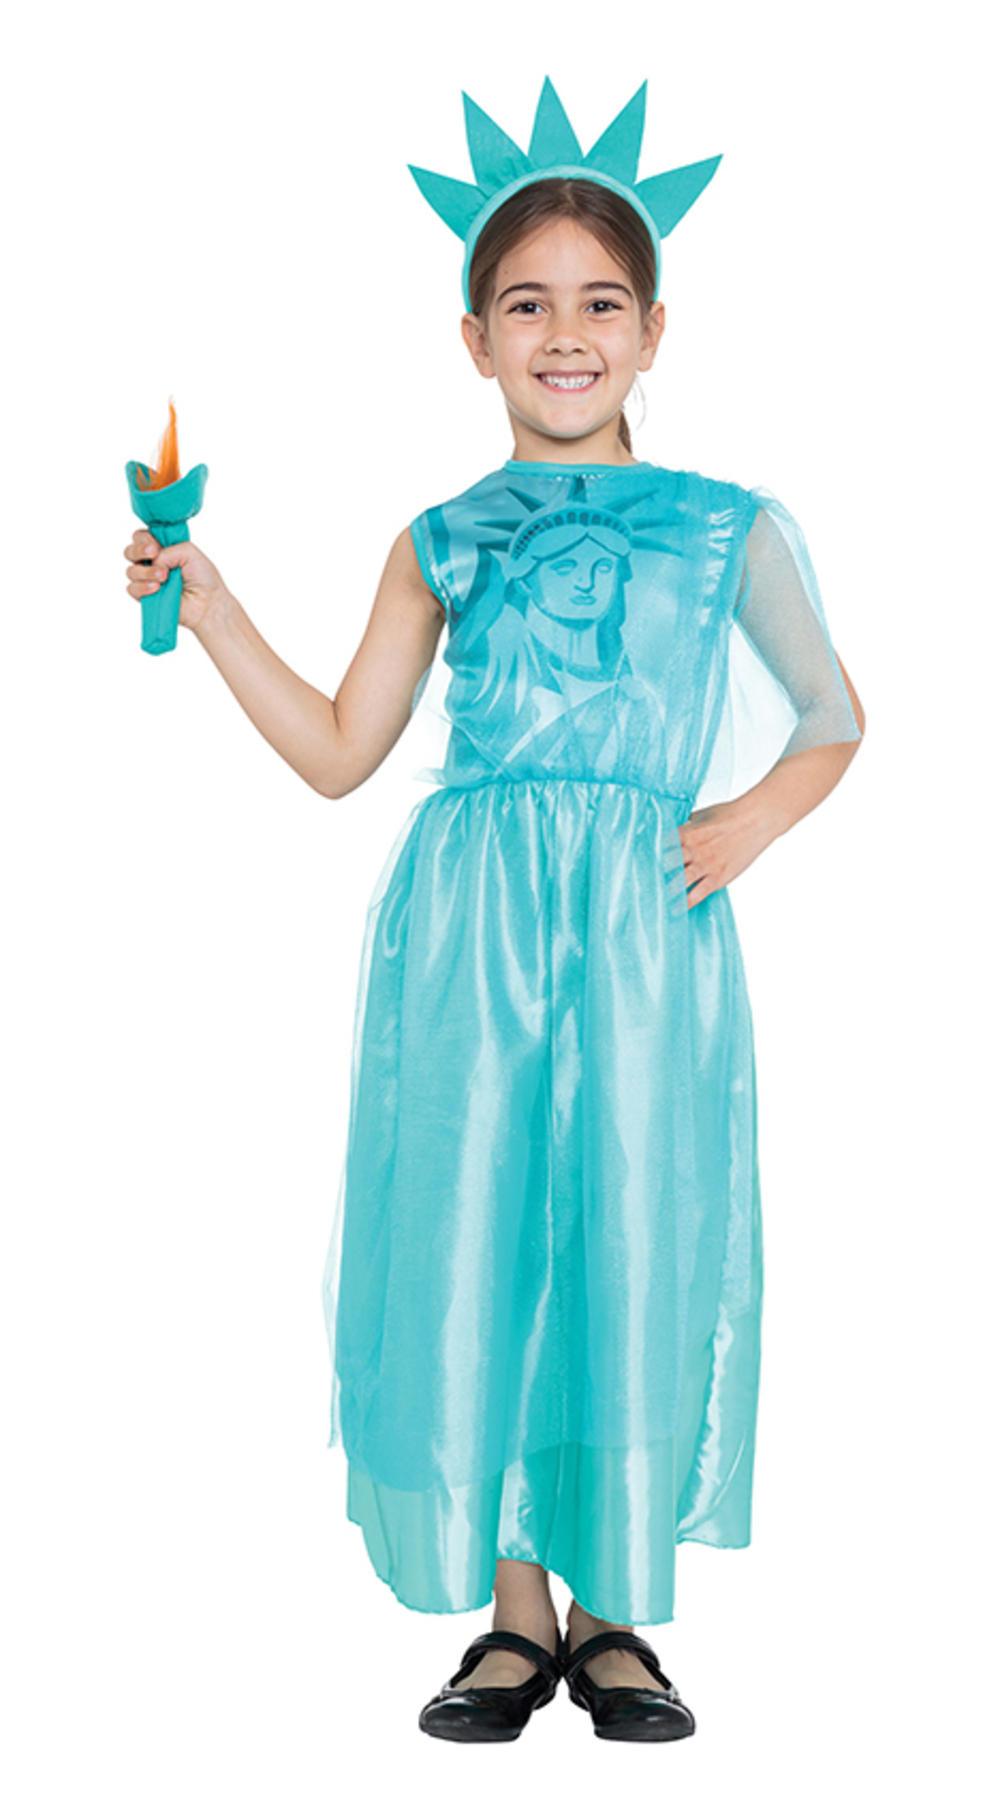 Statue of Liberty Girls Fancy Dress USA American New York 4th July Kids Costume